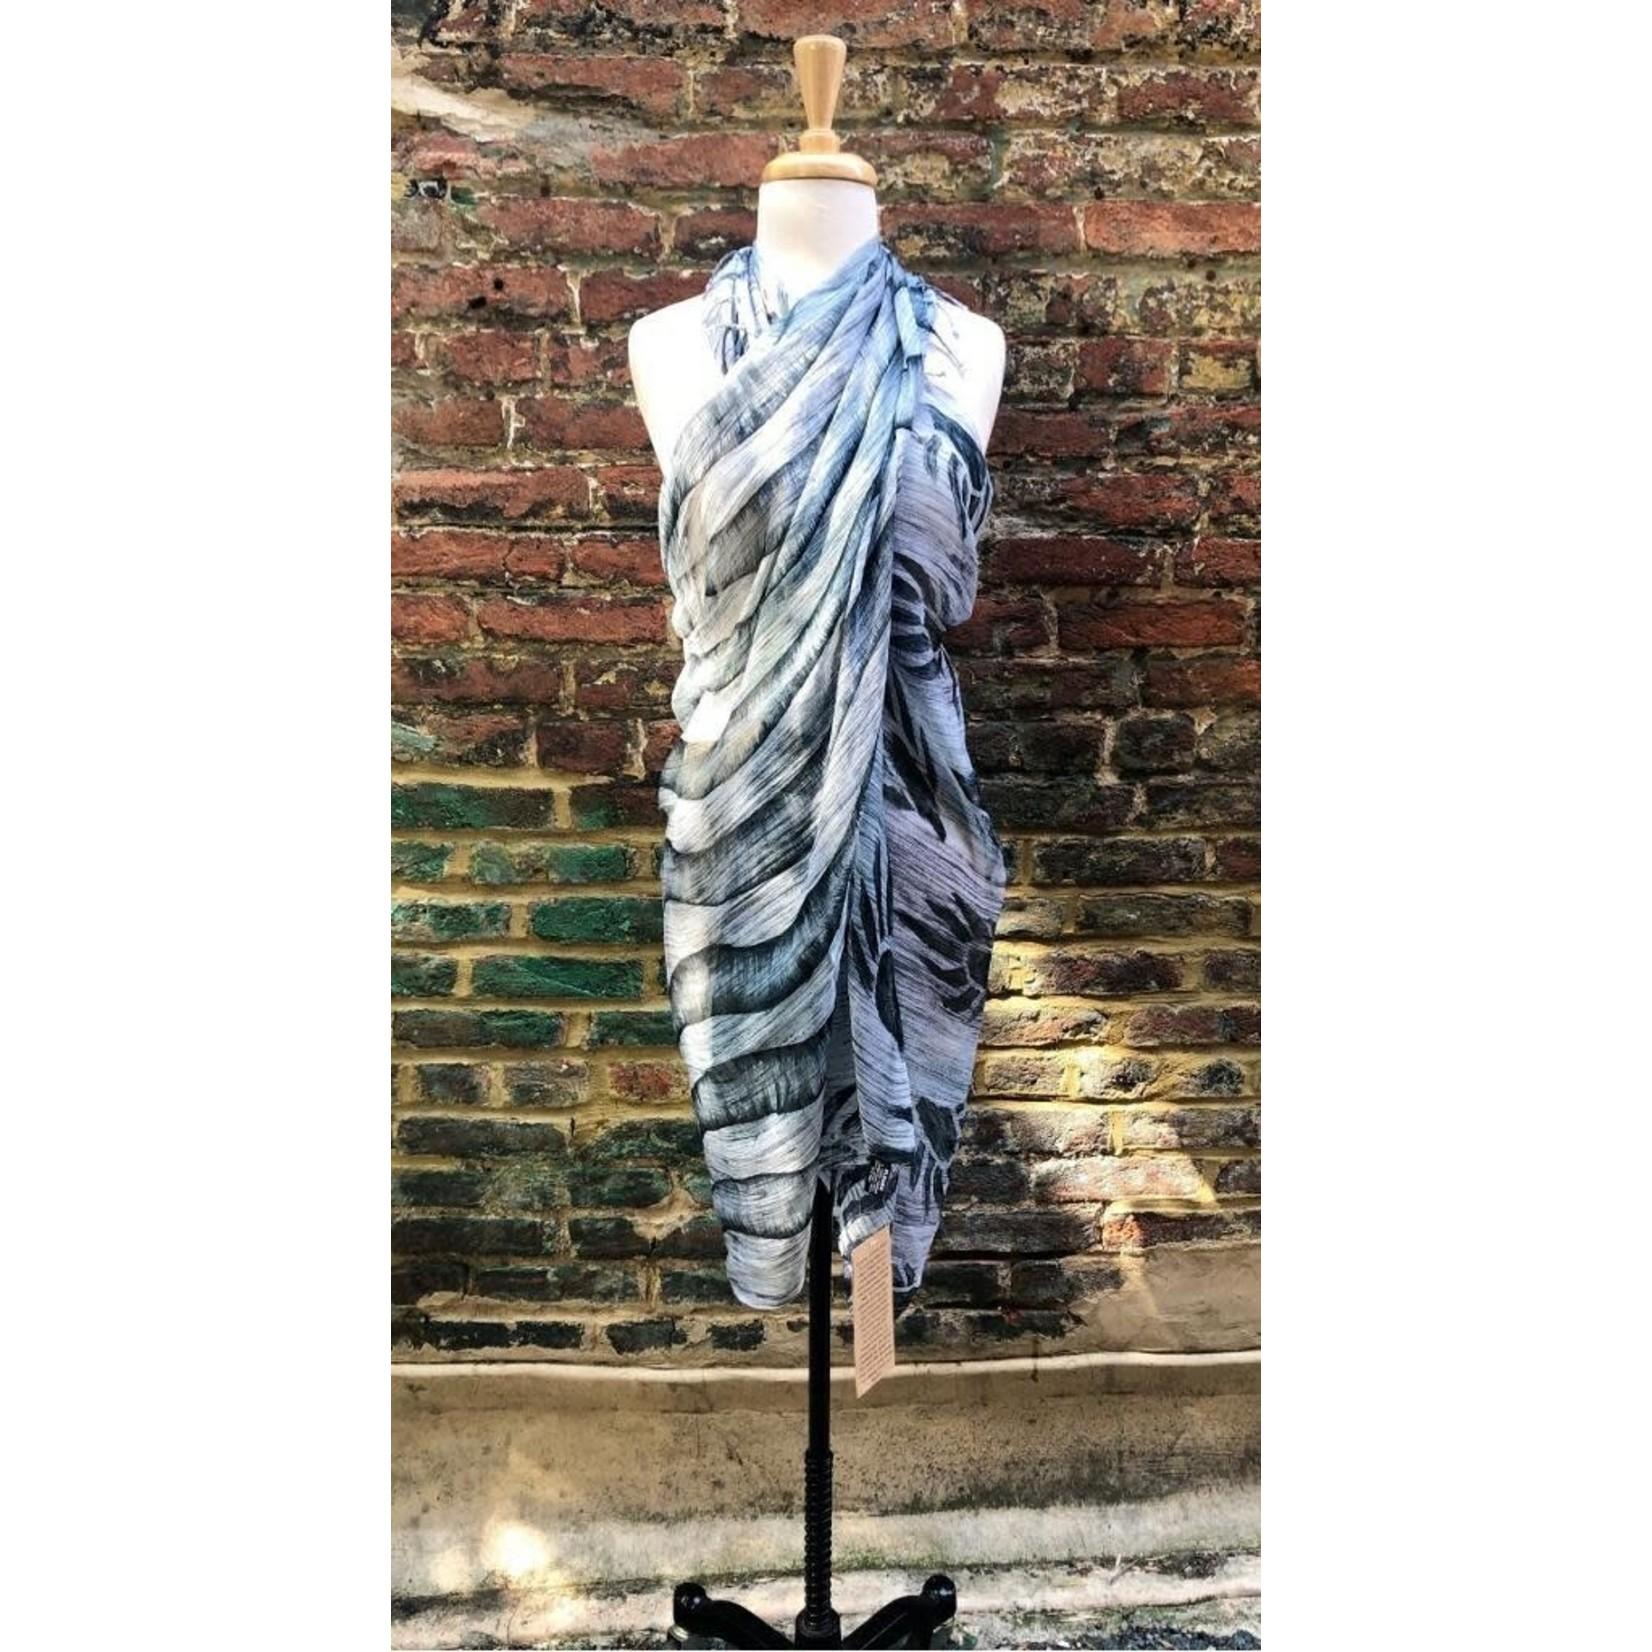 Handbrushed/Handpainted Silk Scarf w/ Abstract Starburst Asstd Colors